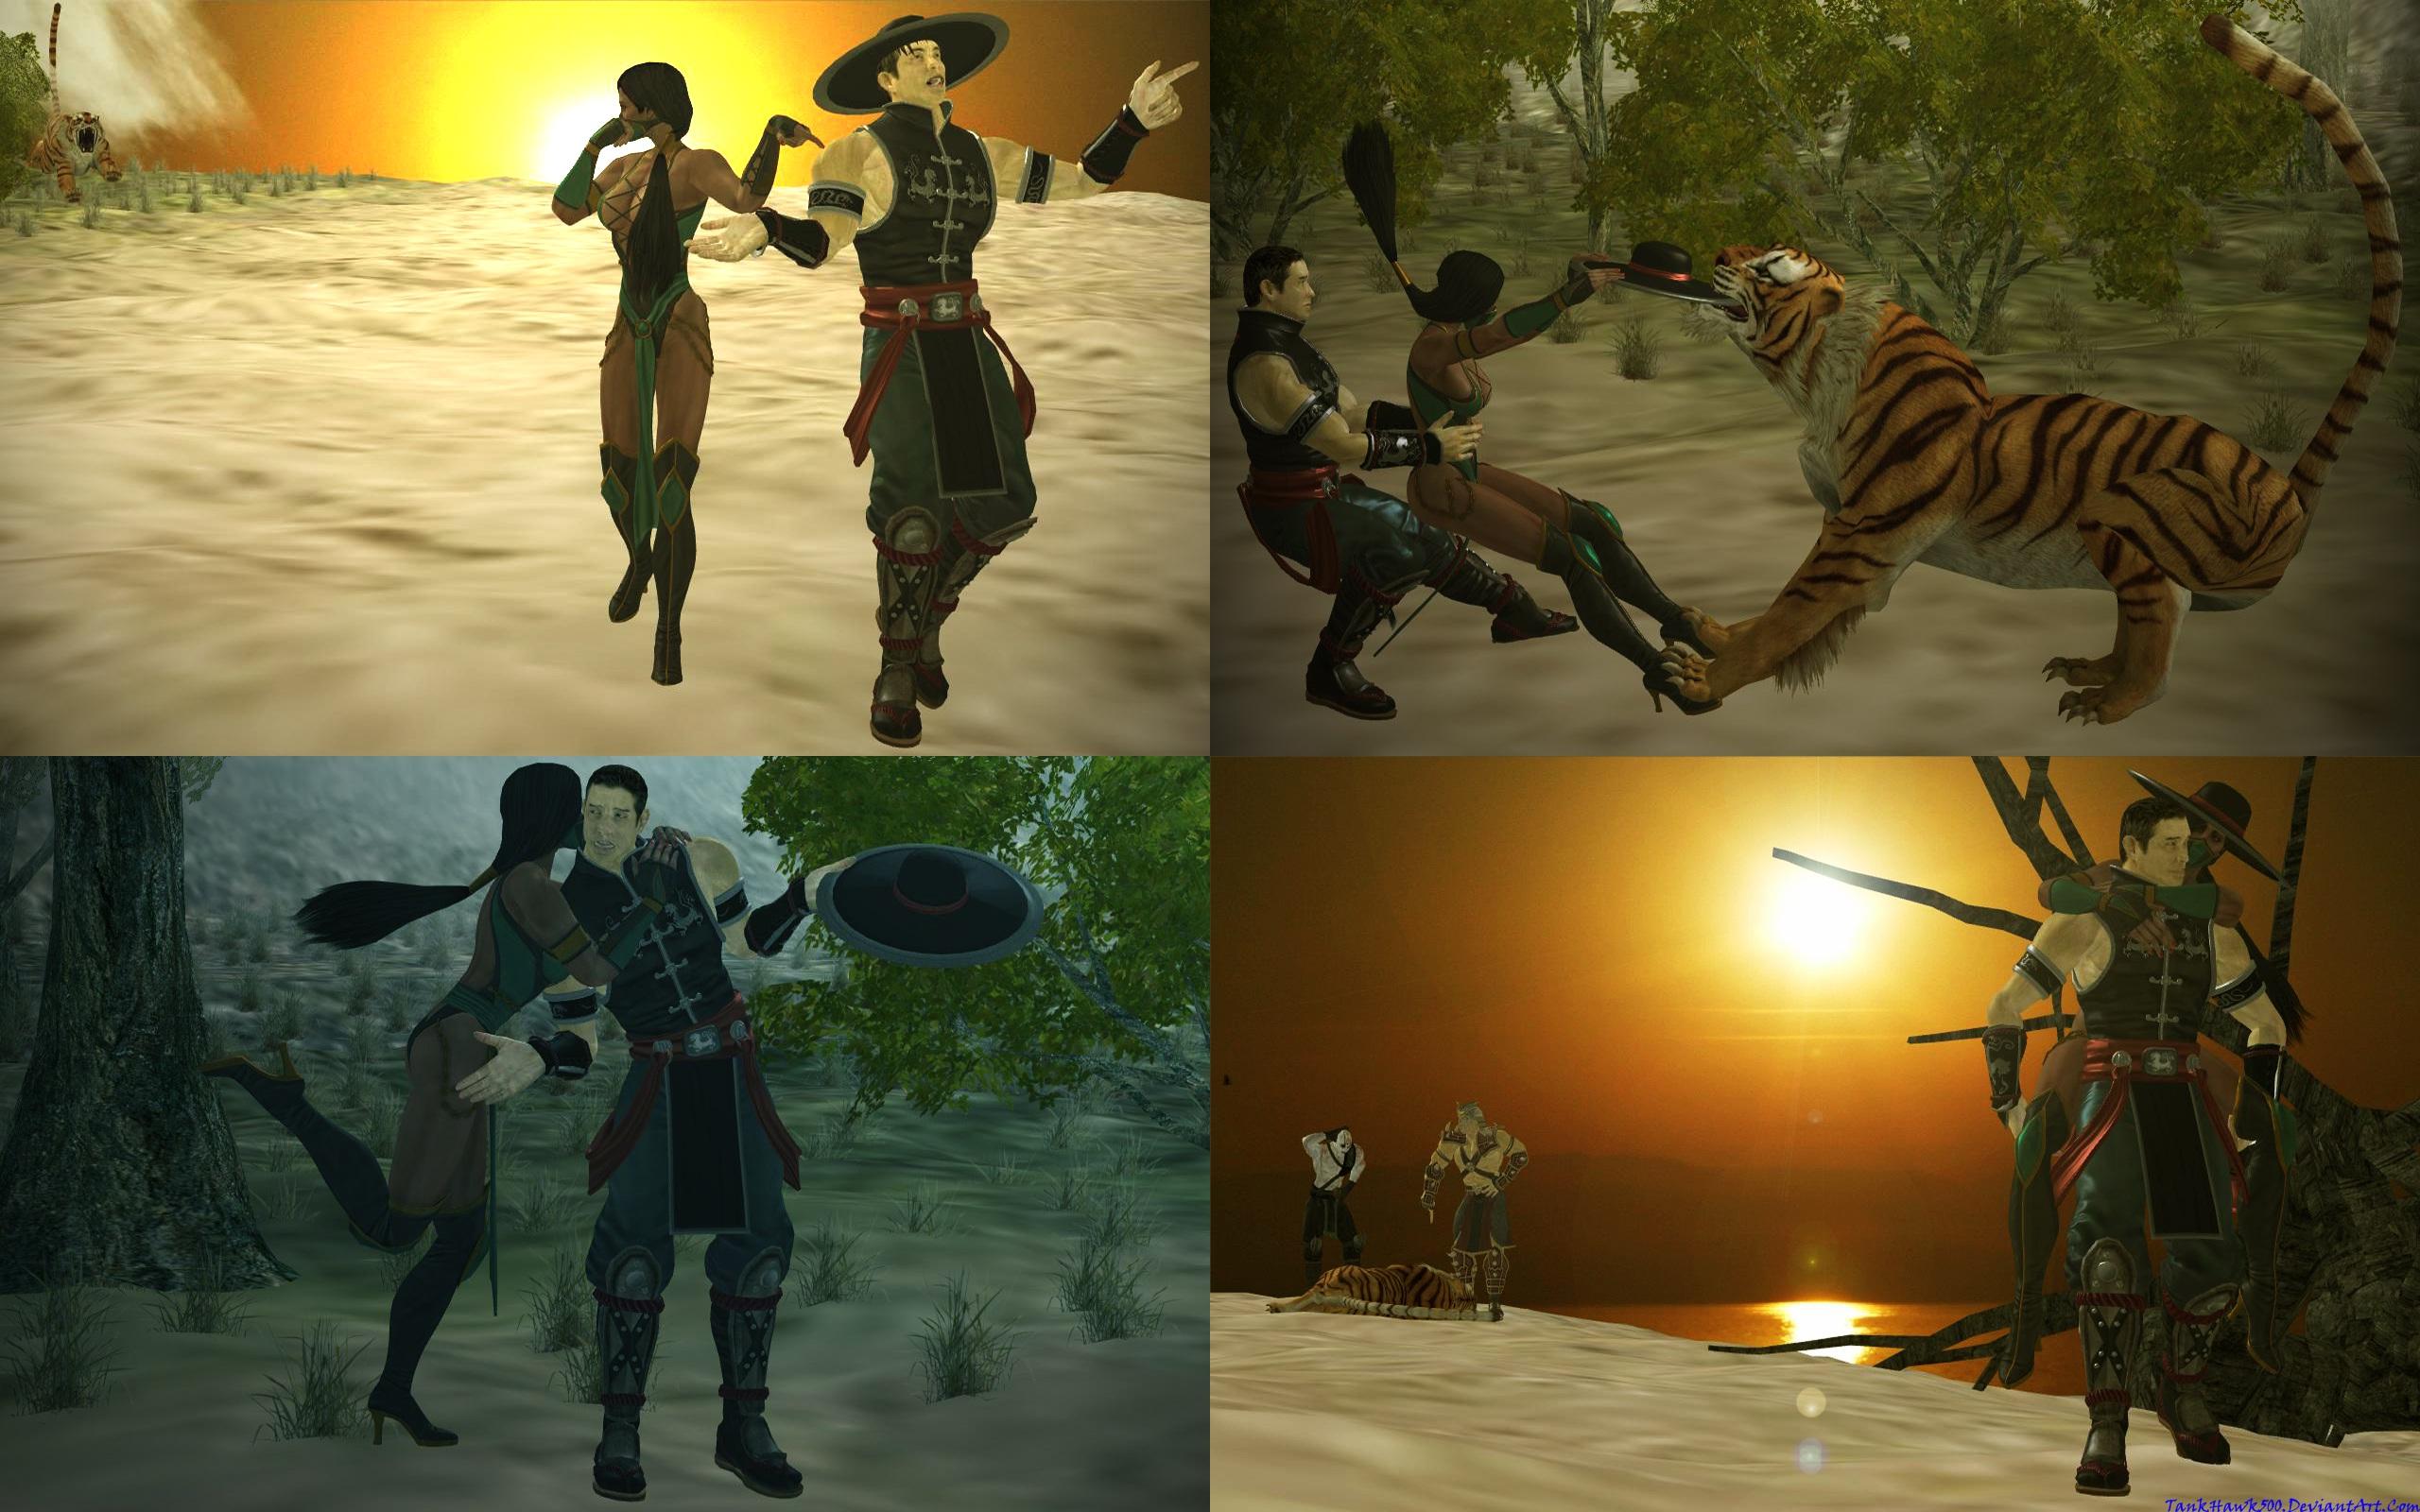 Mortal Kombat: Kano by JhonatasBatalha on DeviantArt